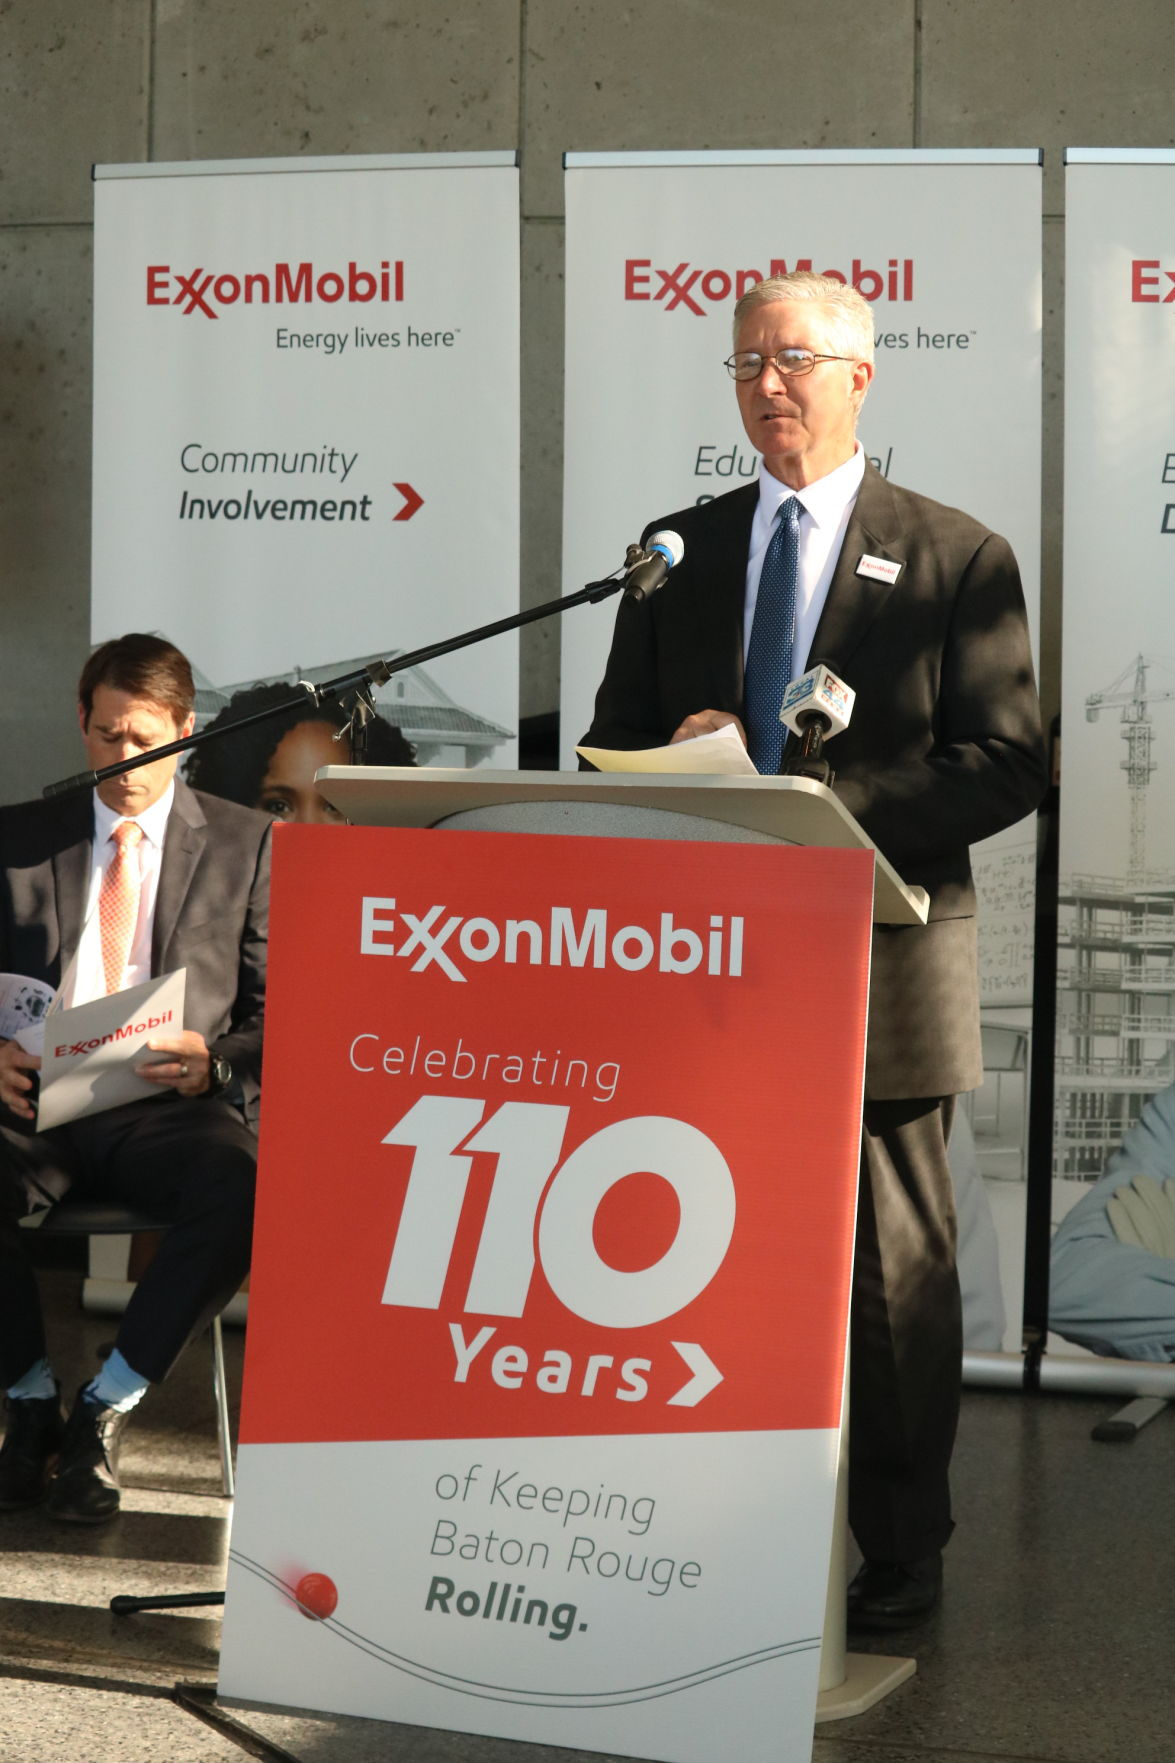 ExxonMobil announces Baton Rouge expansion at 110 year